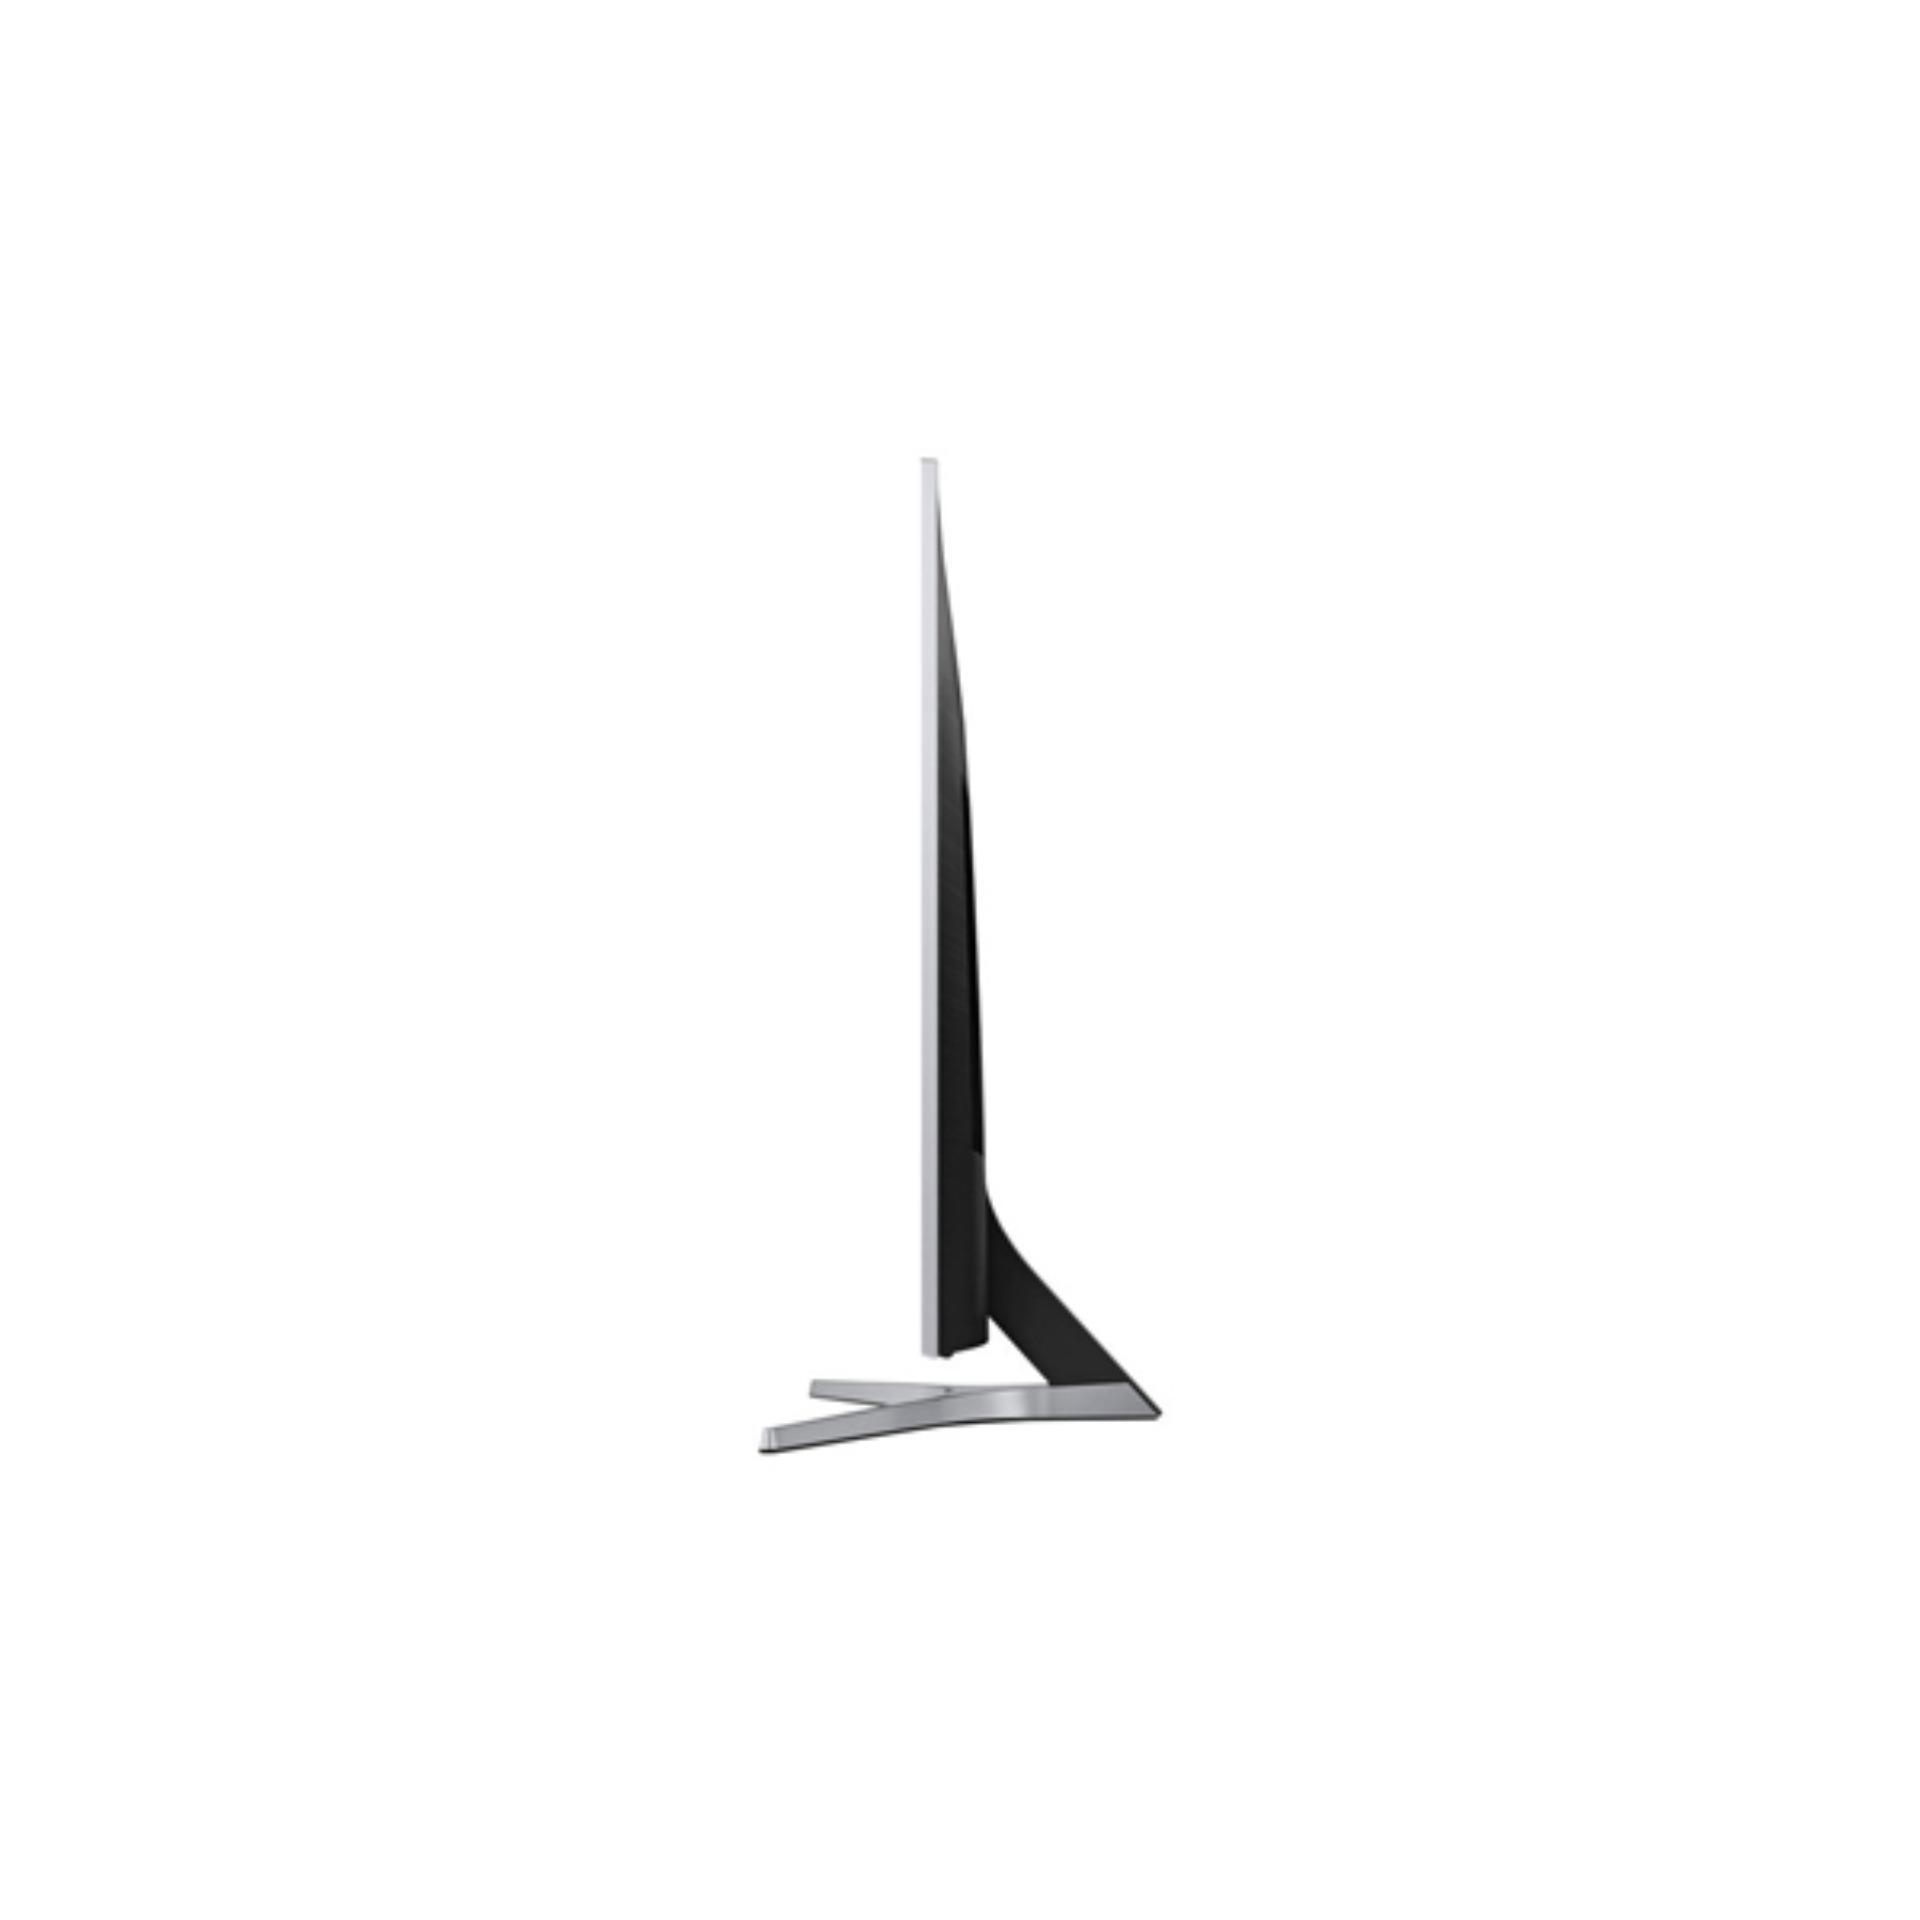 Samsung Ultra Hd Smart Tv 50 50mu6100 Hitam Khusus Jabodetabek Lg 49 Inch Led 49lh511t 55